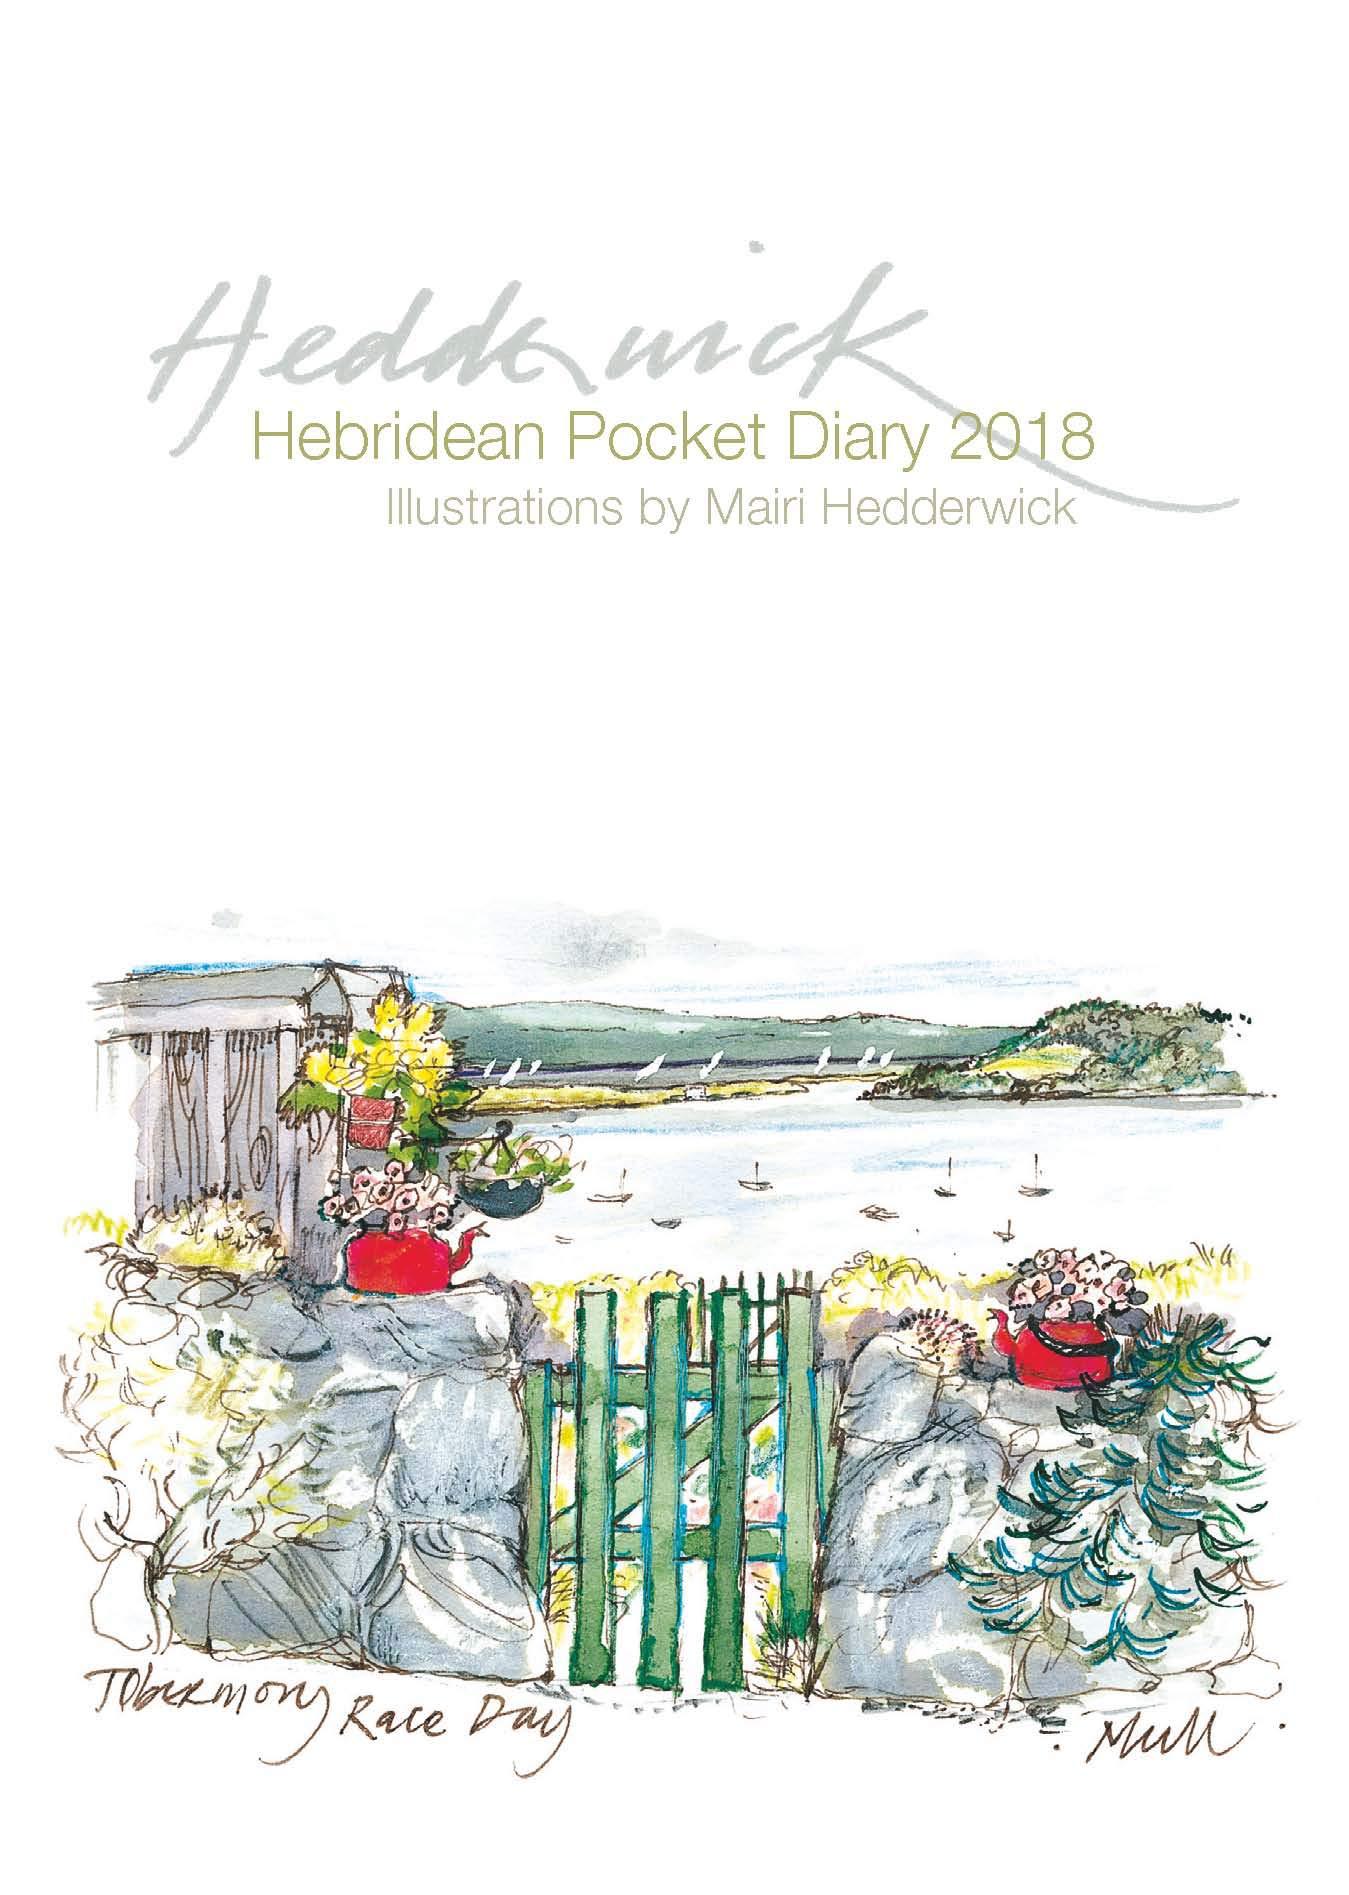 Hebridean Pocket Diary 2018: Amazon.co.uk: Mairi Hedderwick: 9781780274348:  Books